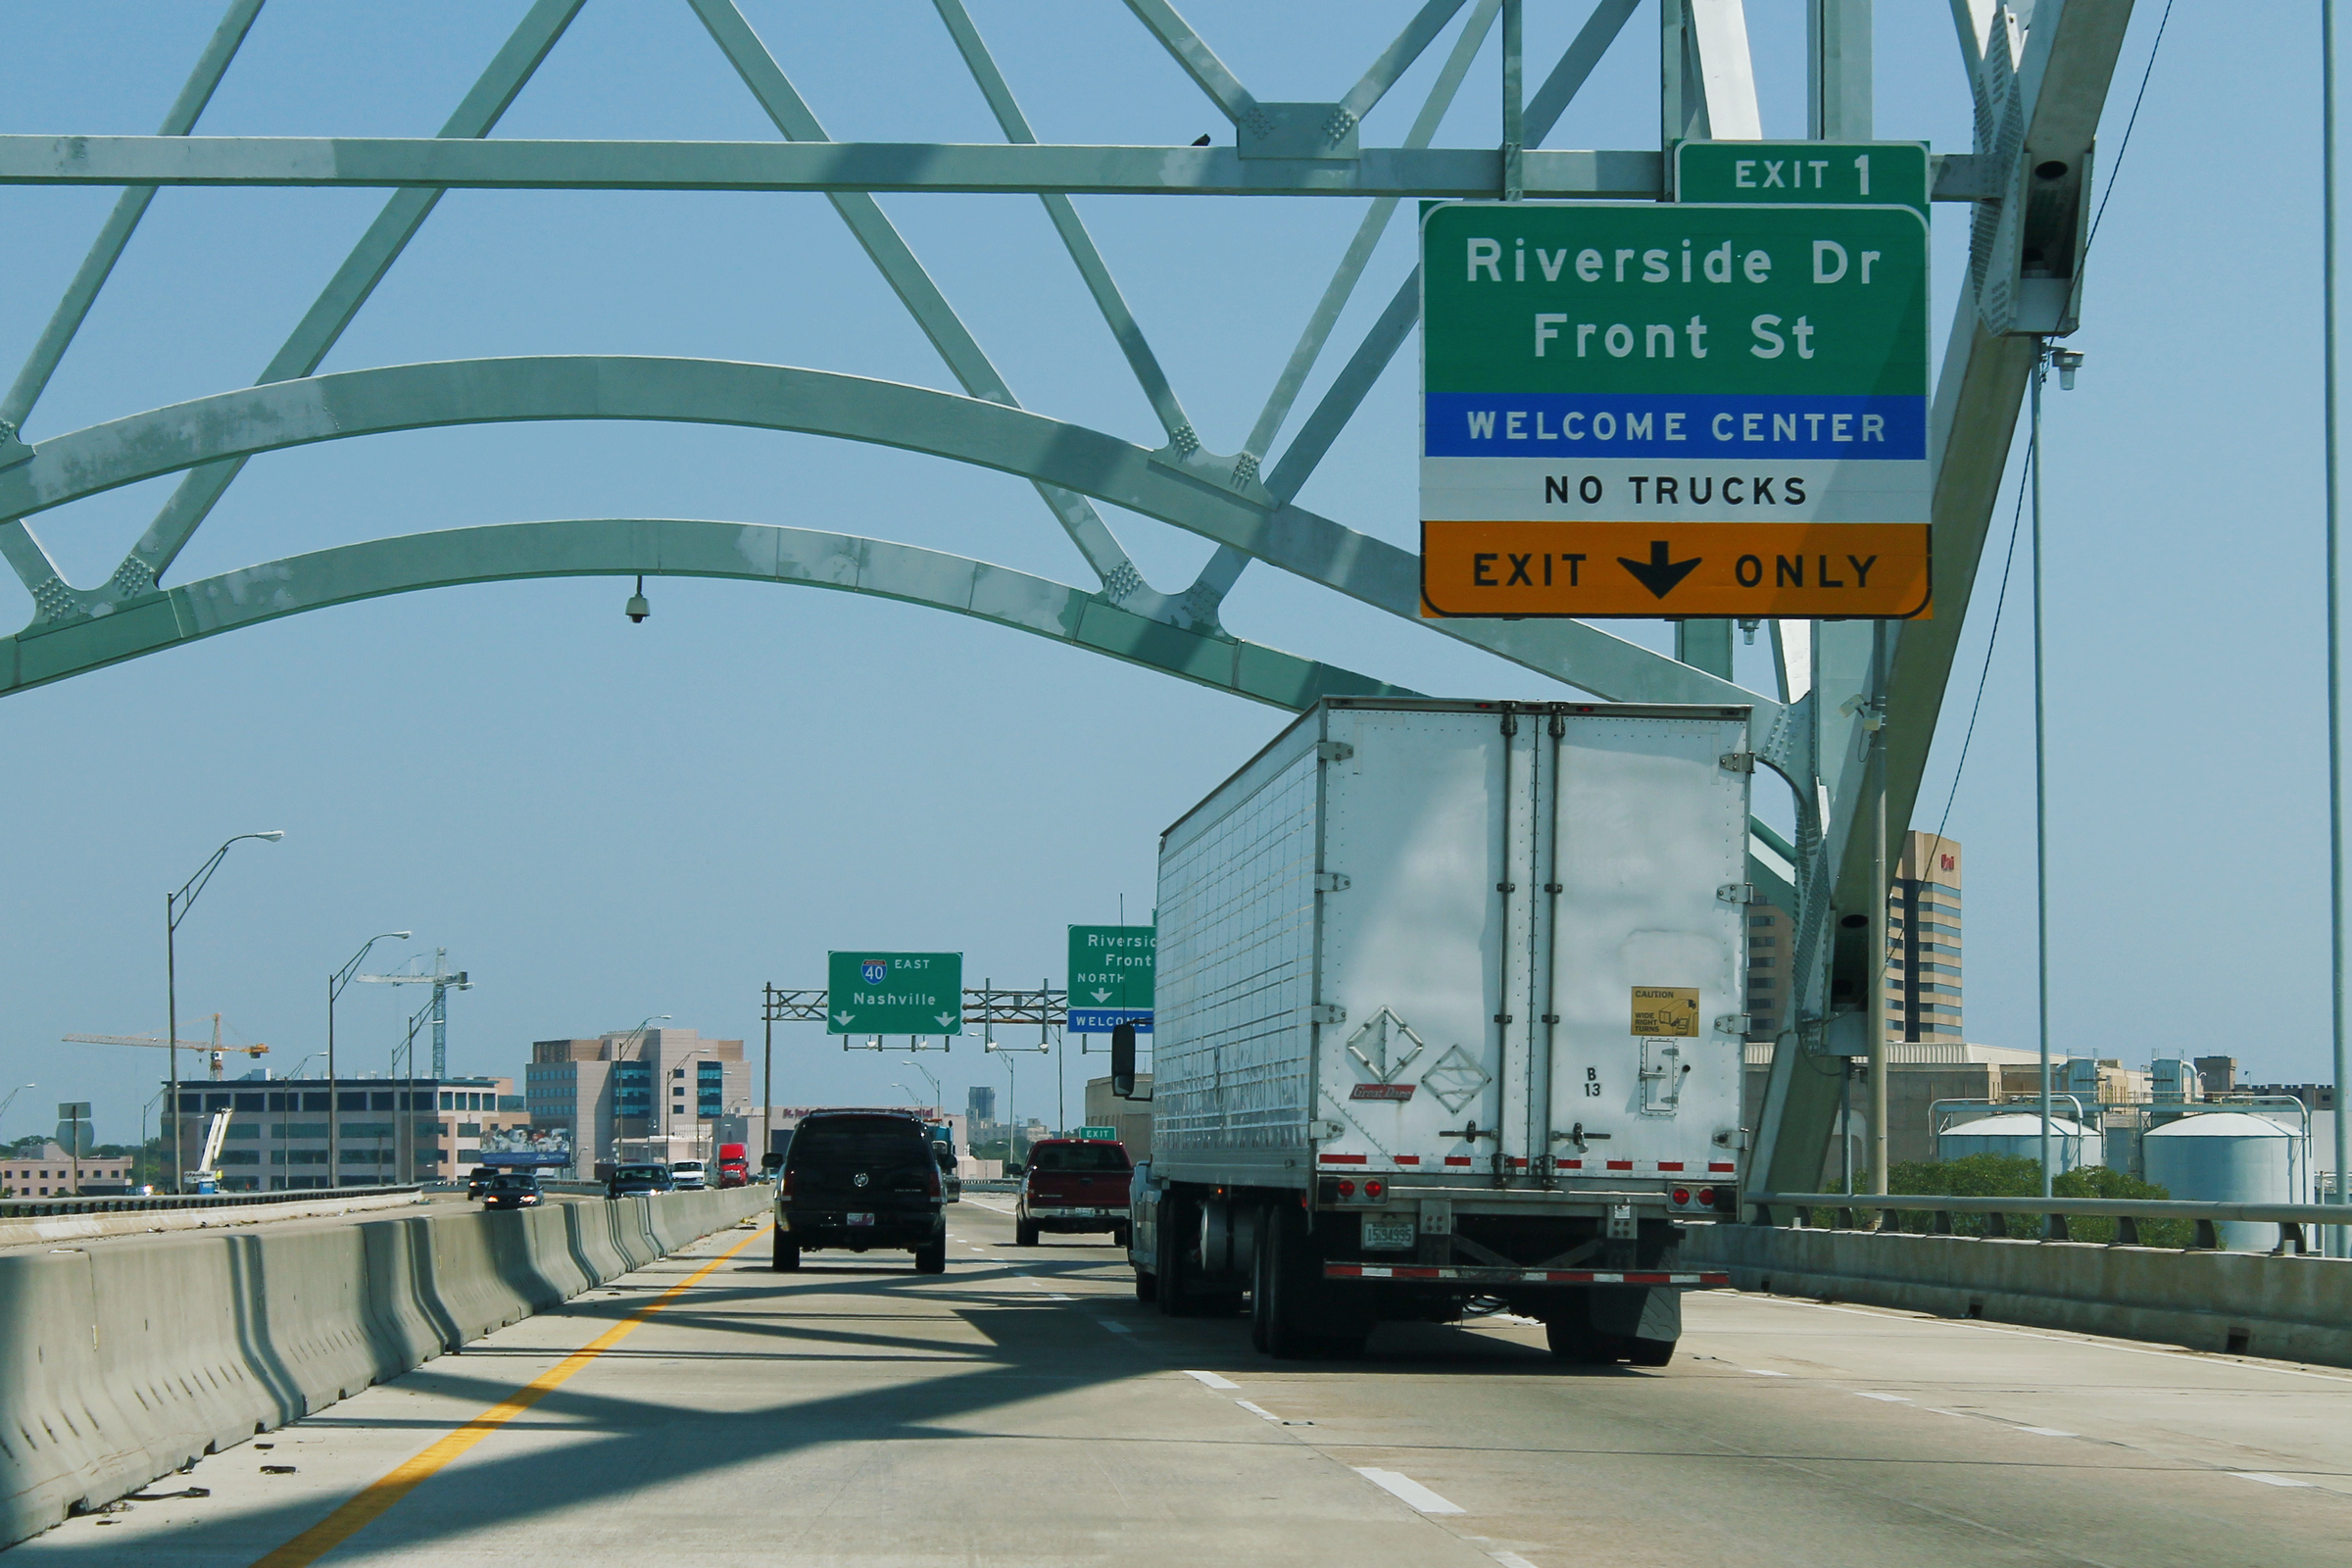 File:I-40 East Exit 1 - Riverside Drive - Memphis